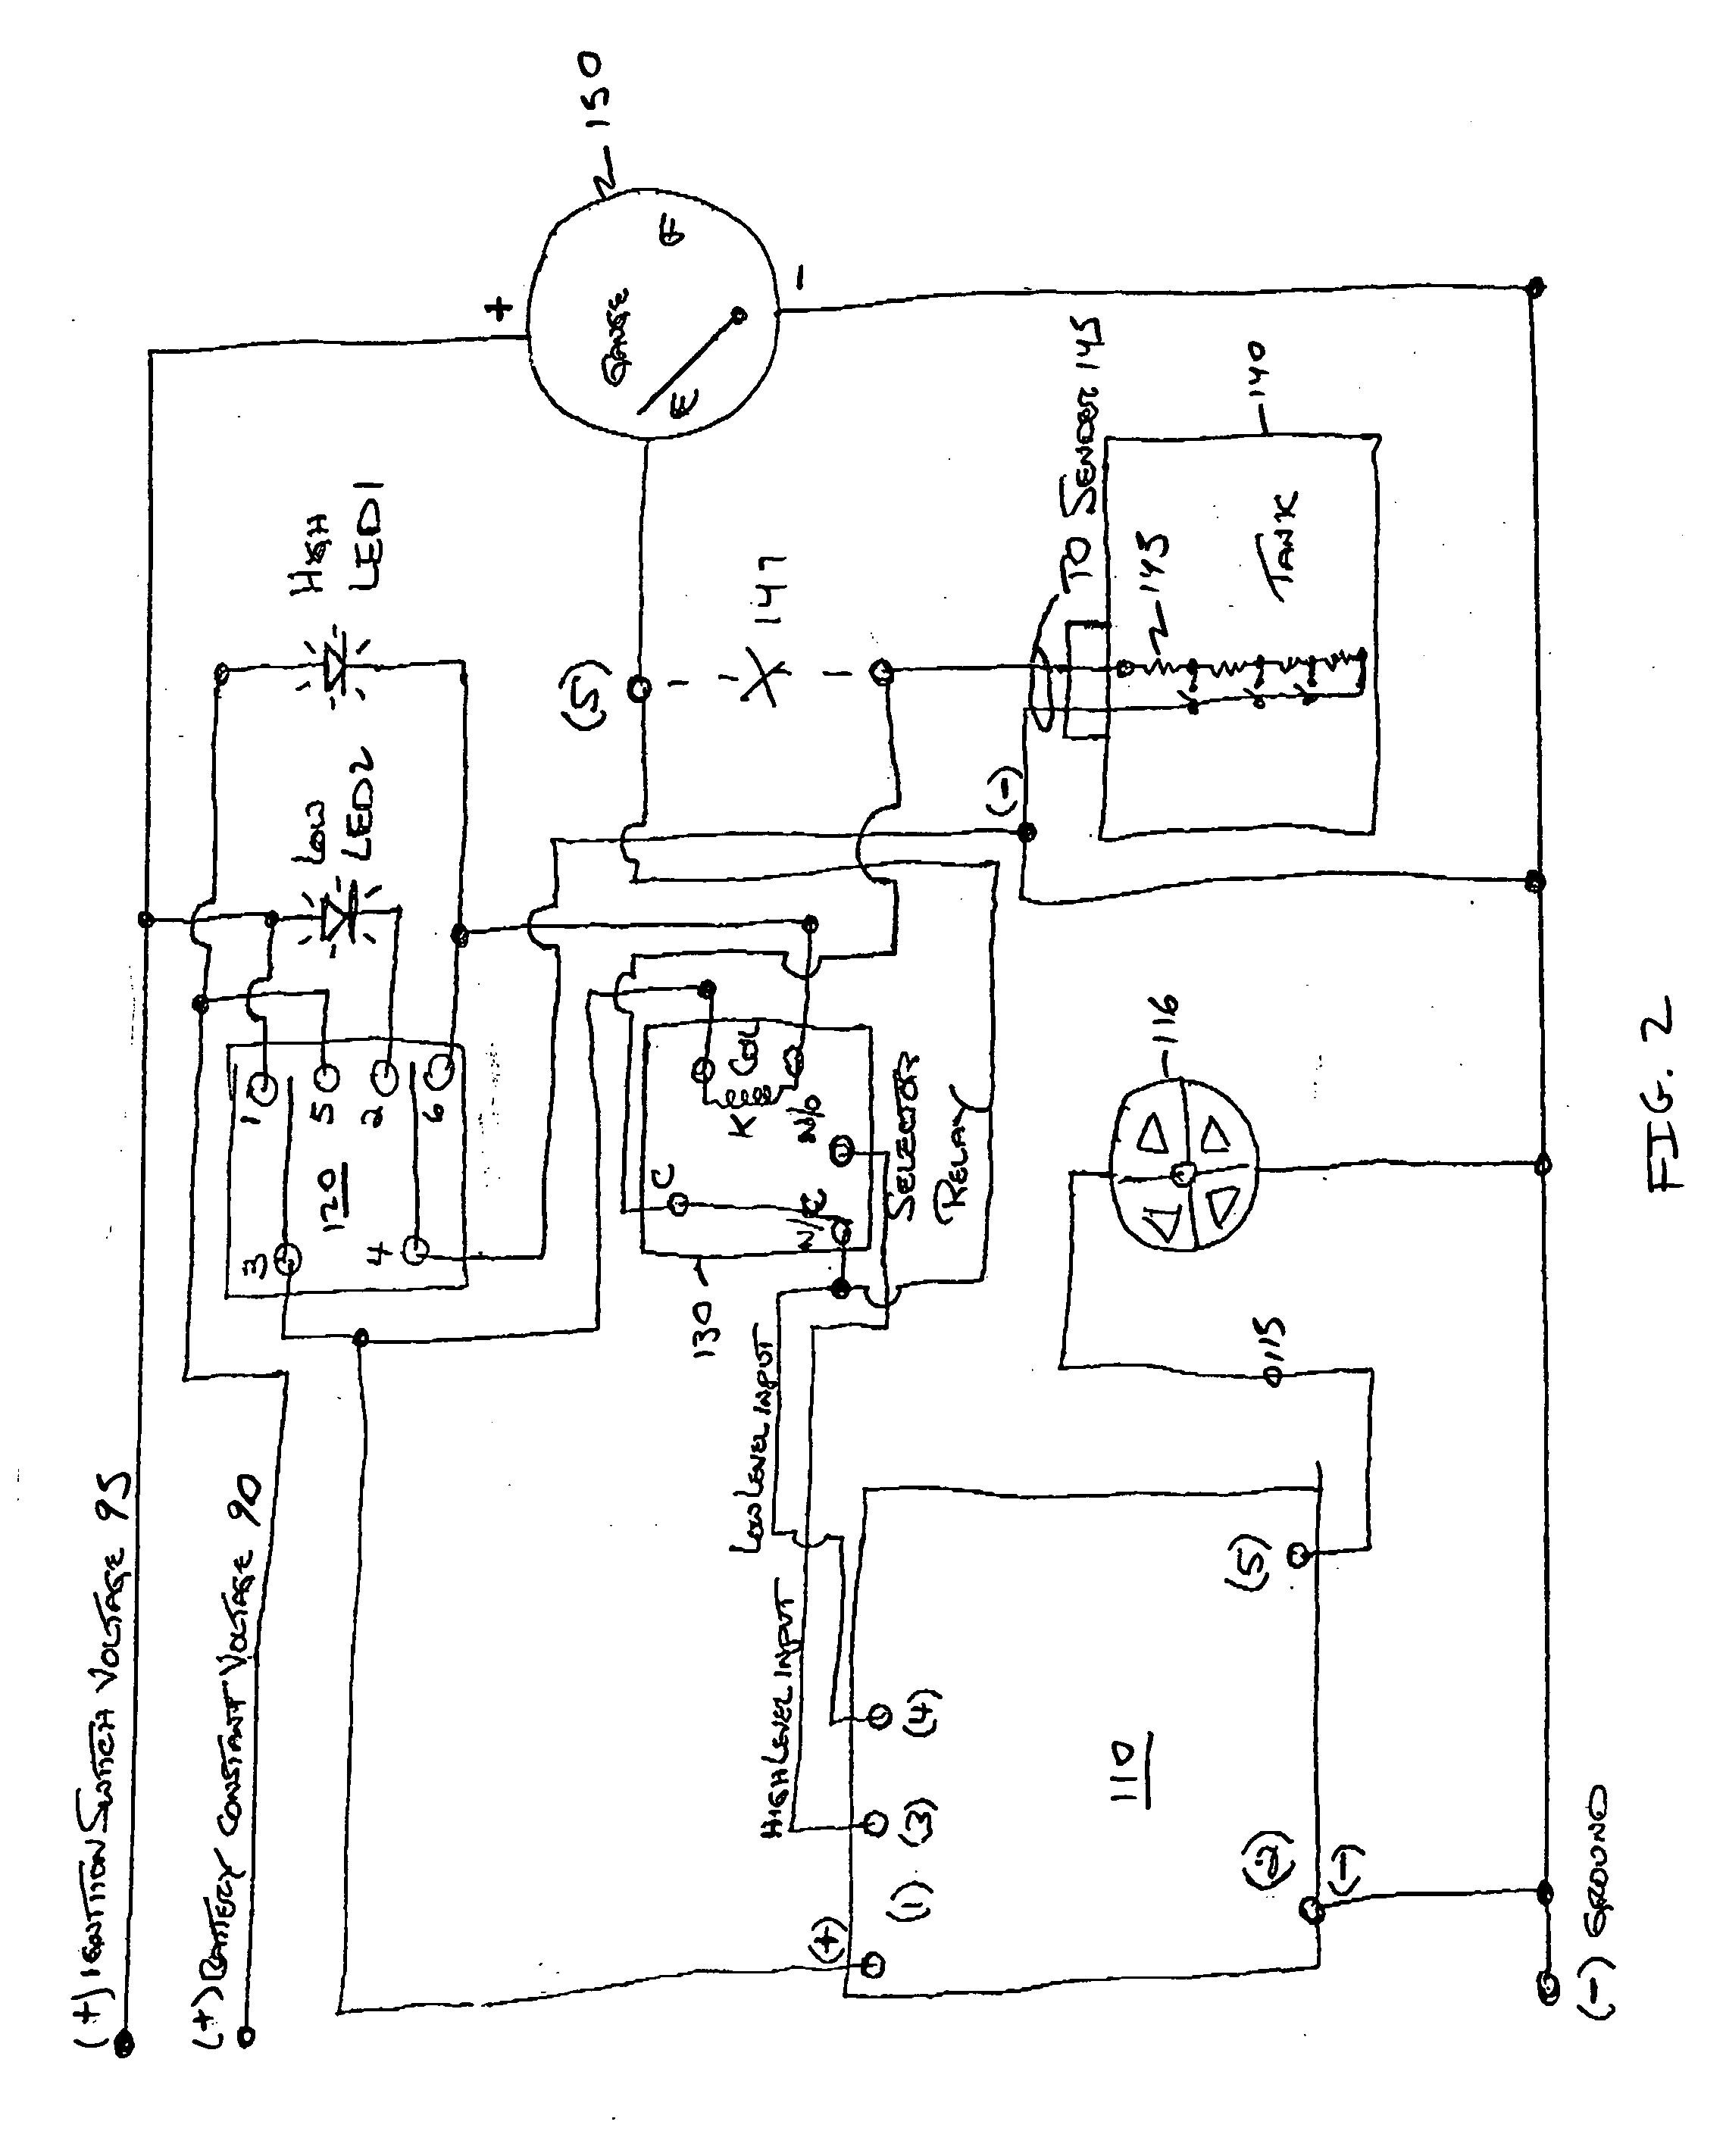 Rv Holding Tank Monitor Panel Wiring Diagram